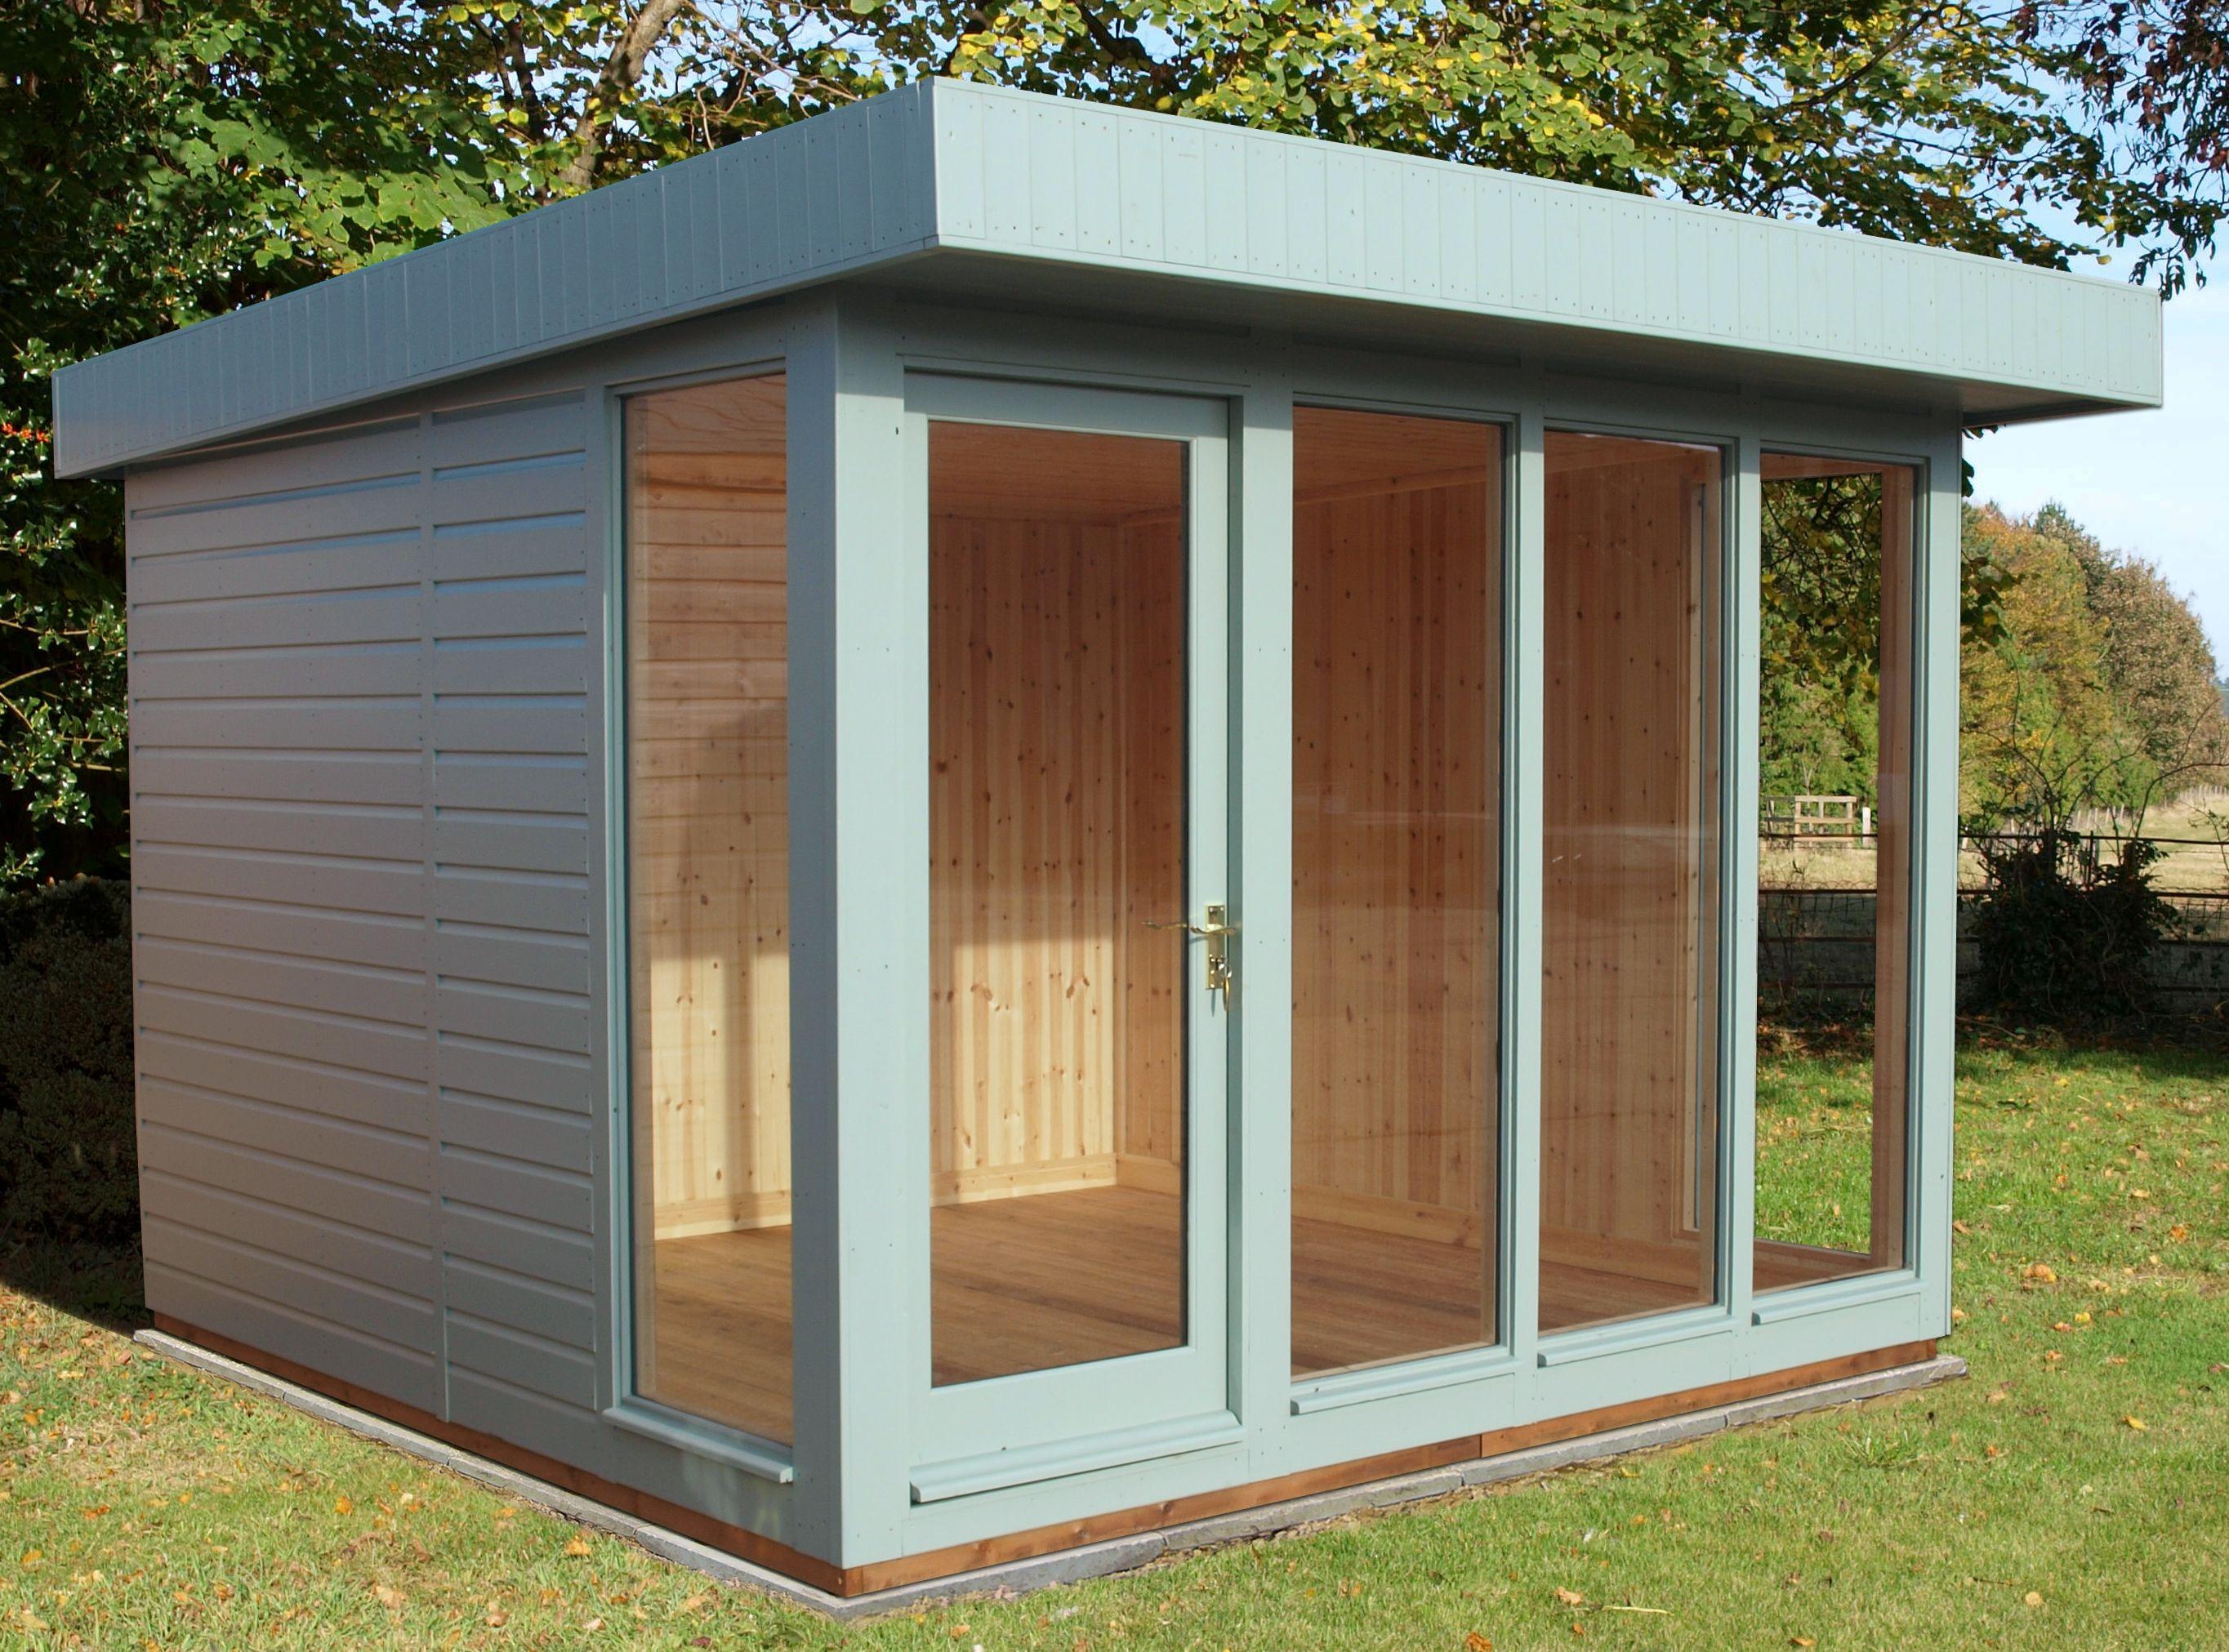 backyard shed designs  Contemporary Garden Sheds  Where